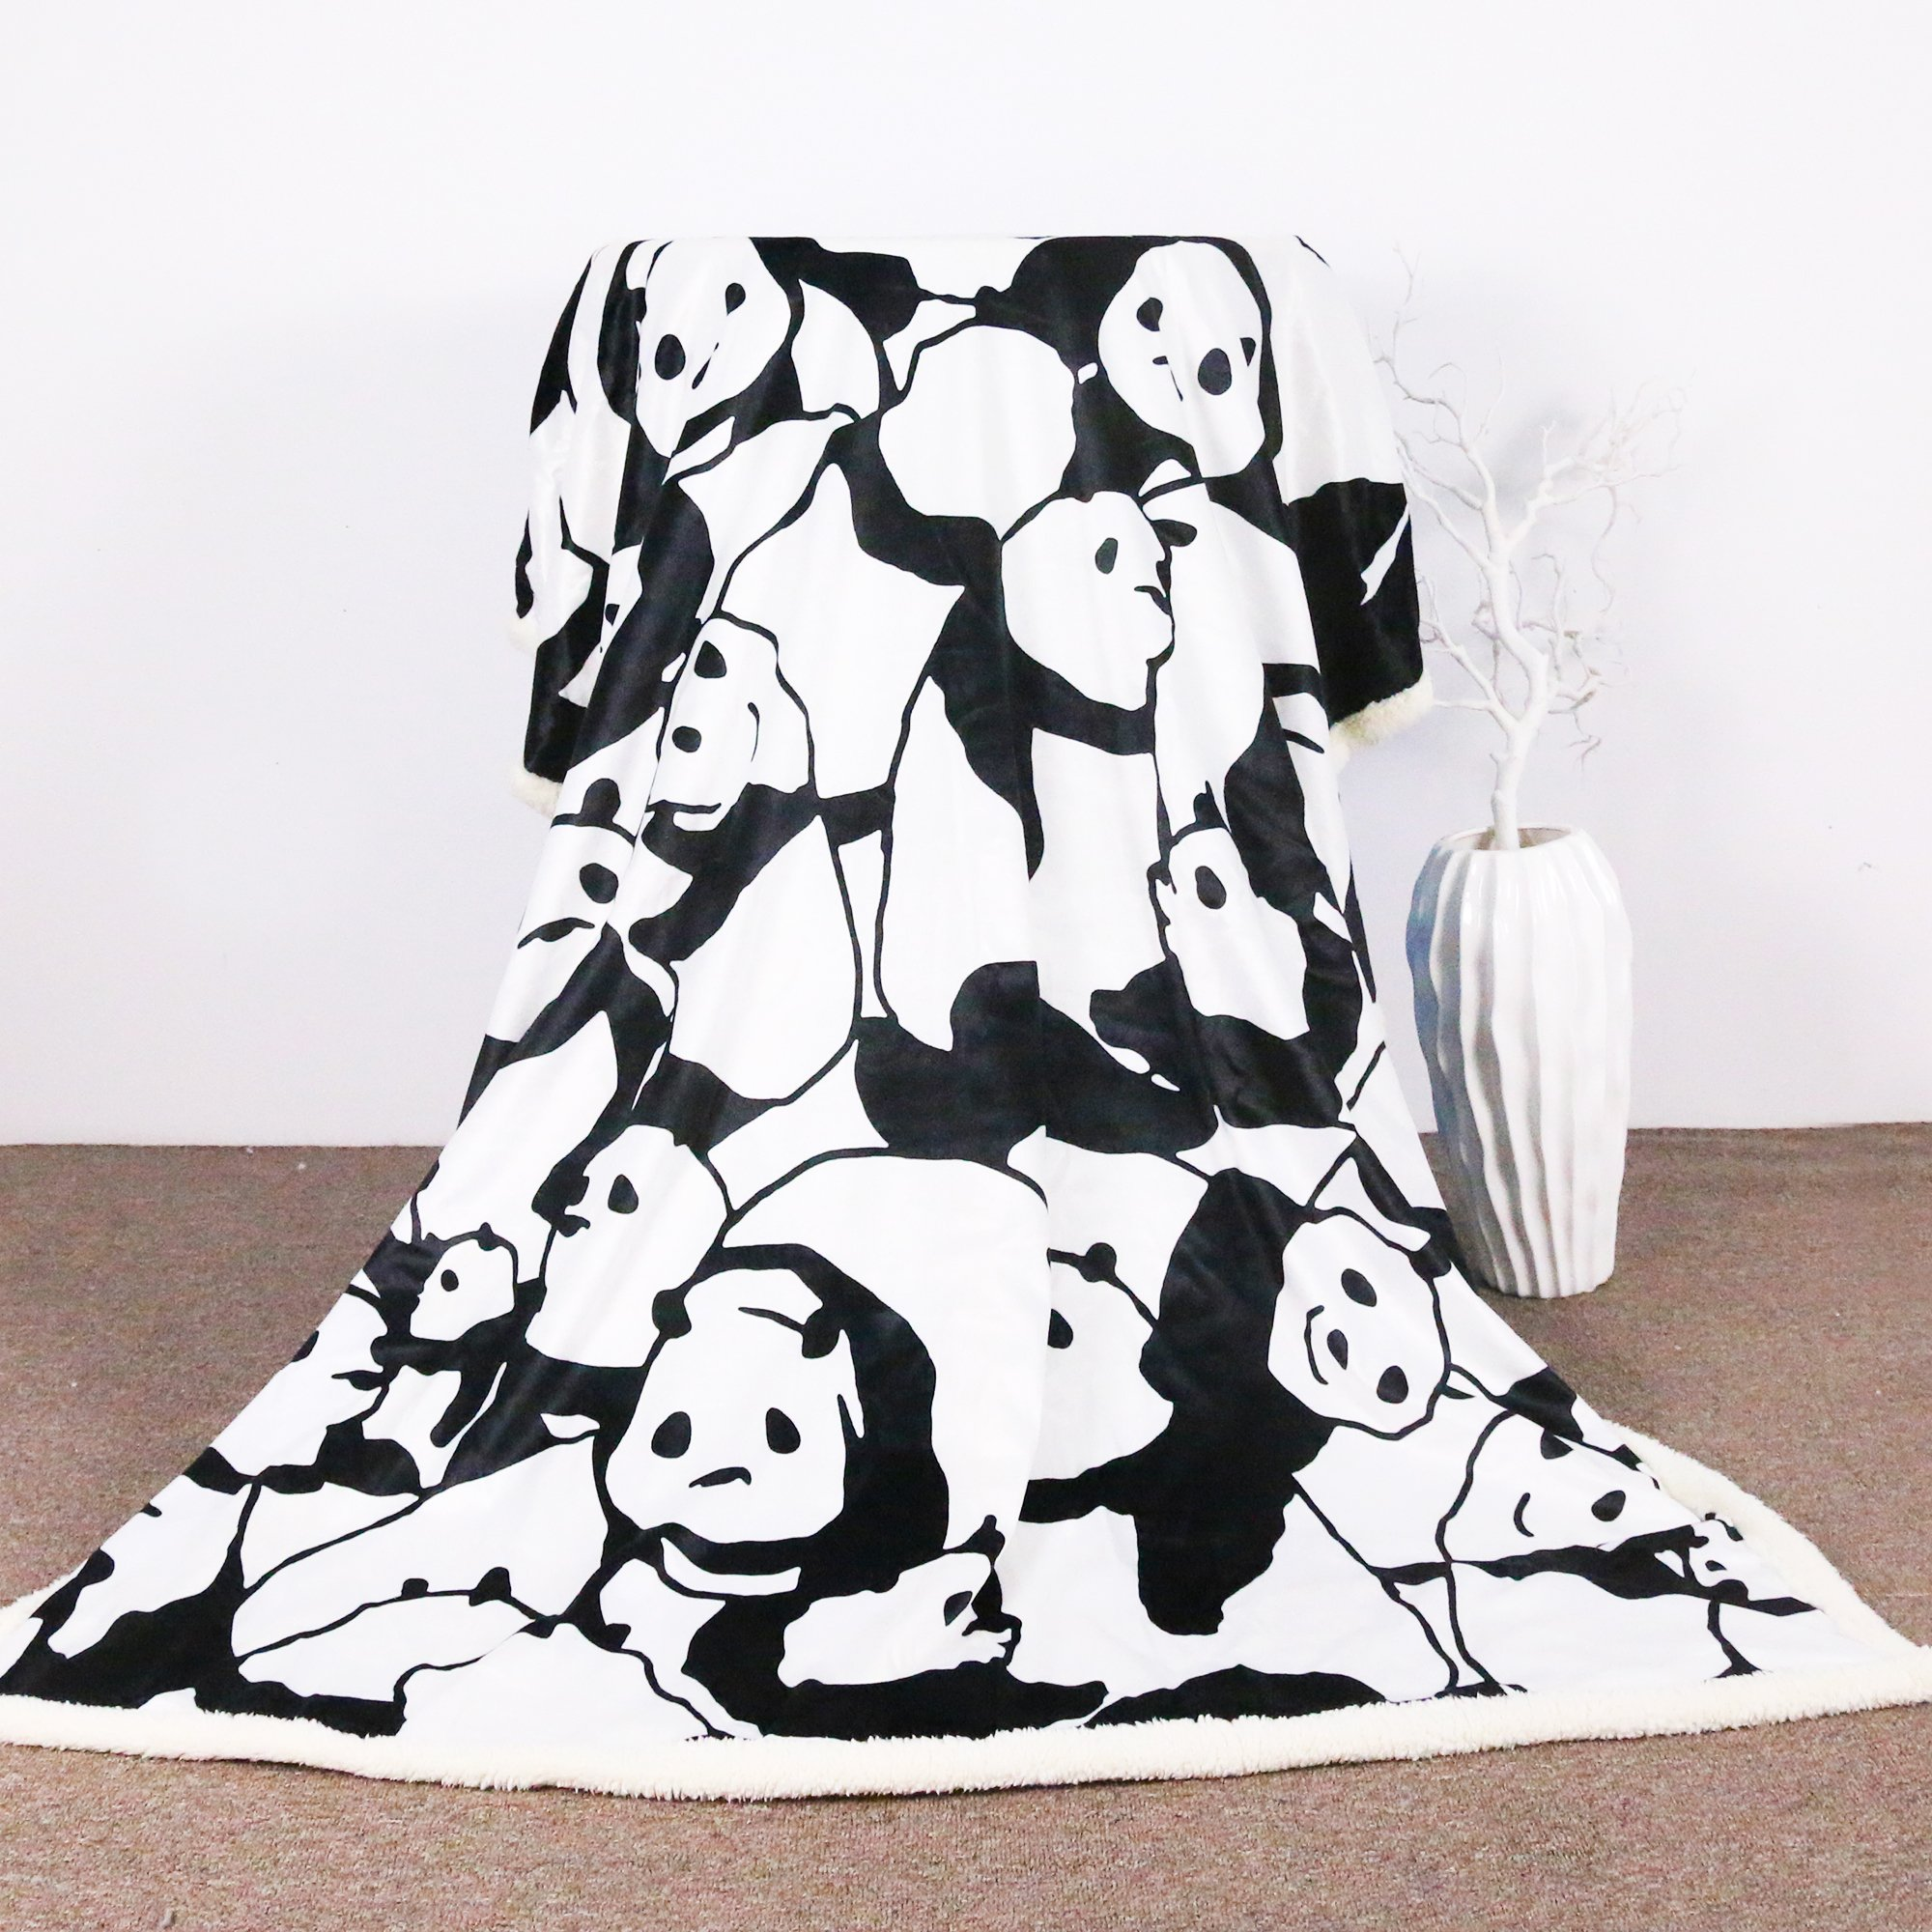 Sleepwish Panda Plush Blanket Cartoon Animal Throw Blanket Cute Panda Bears Graphic Pattern Kids Blankets Fleece (60x80 Inches) by Sleepwish